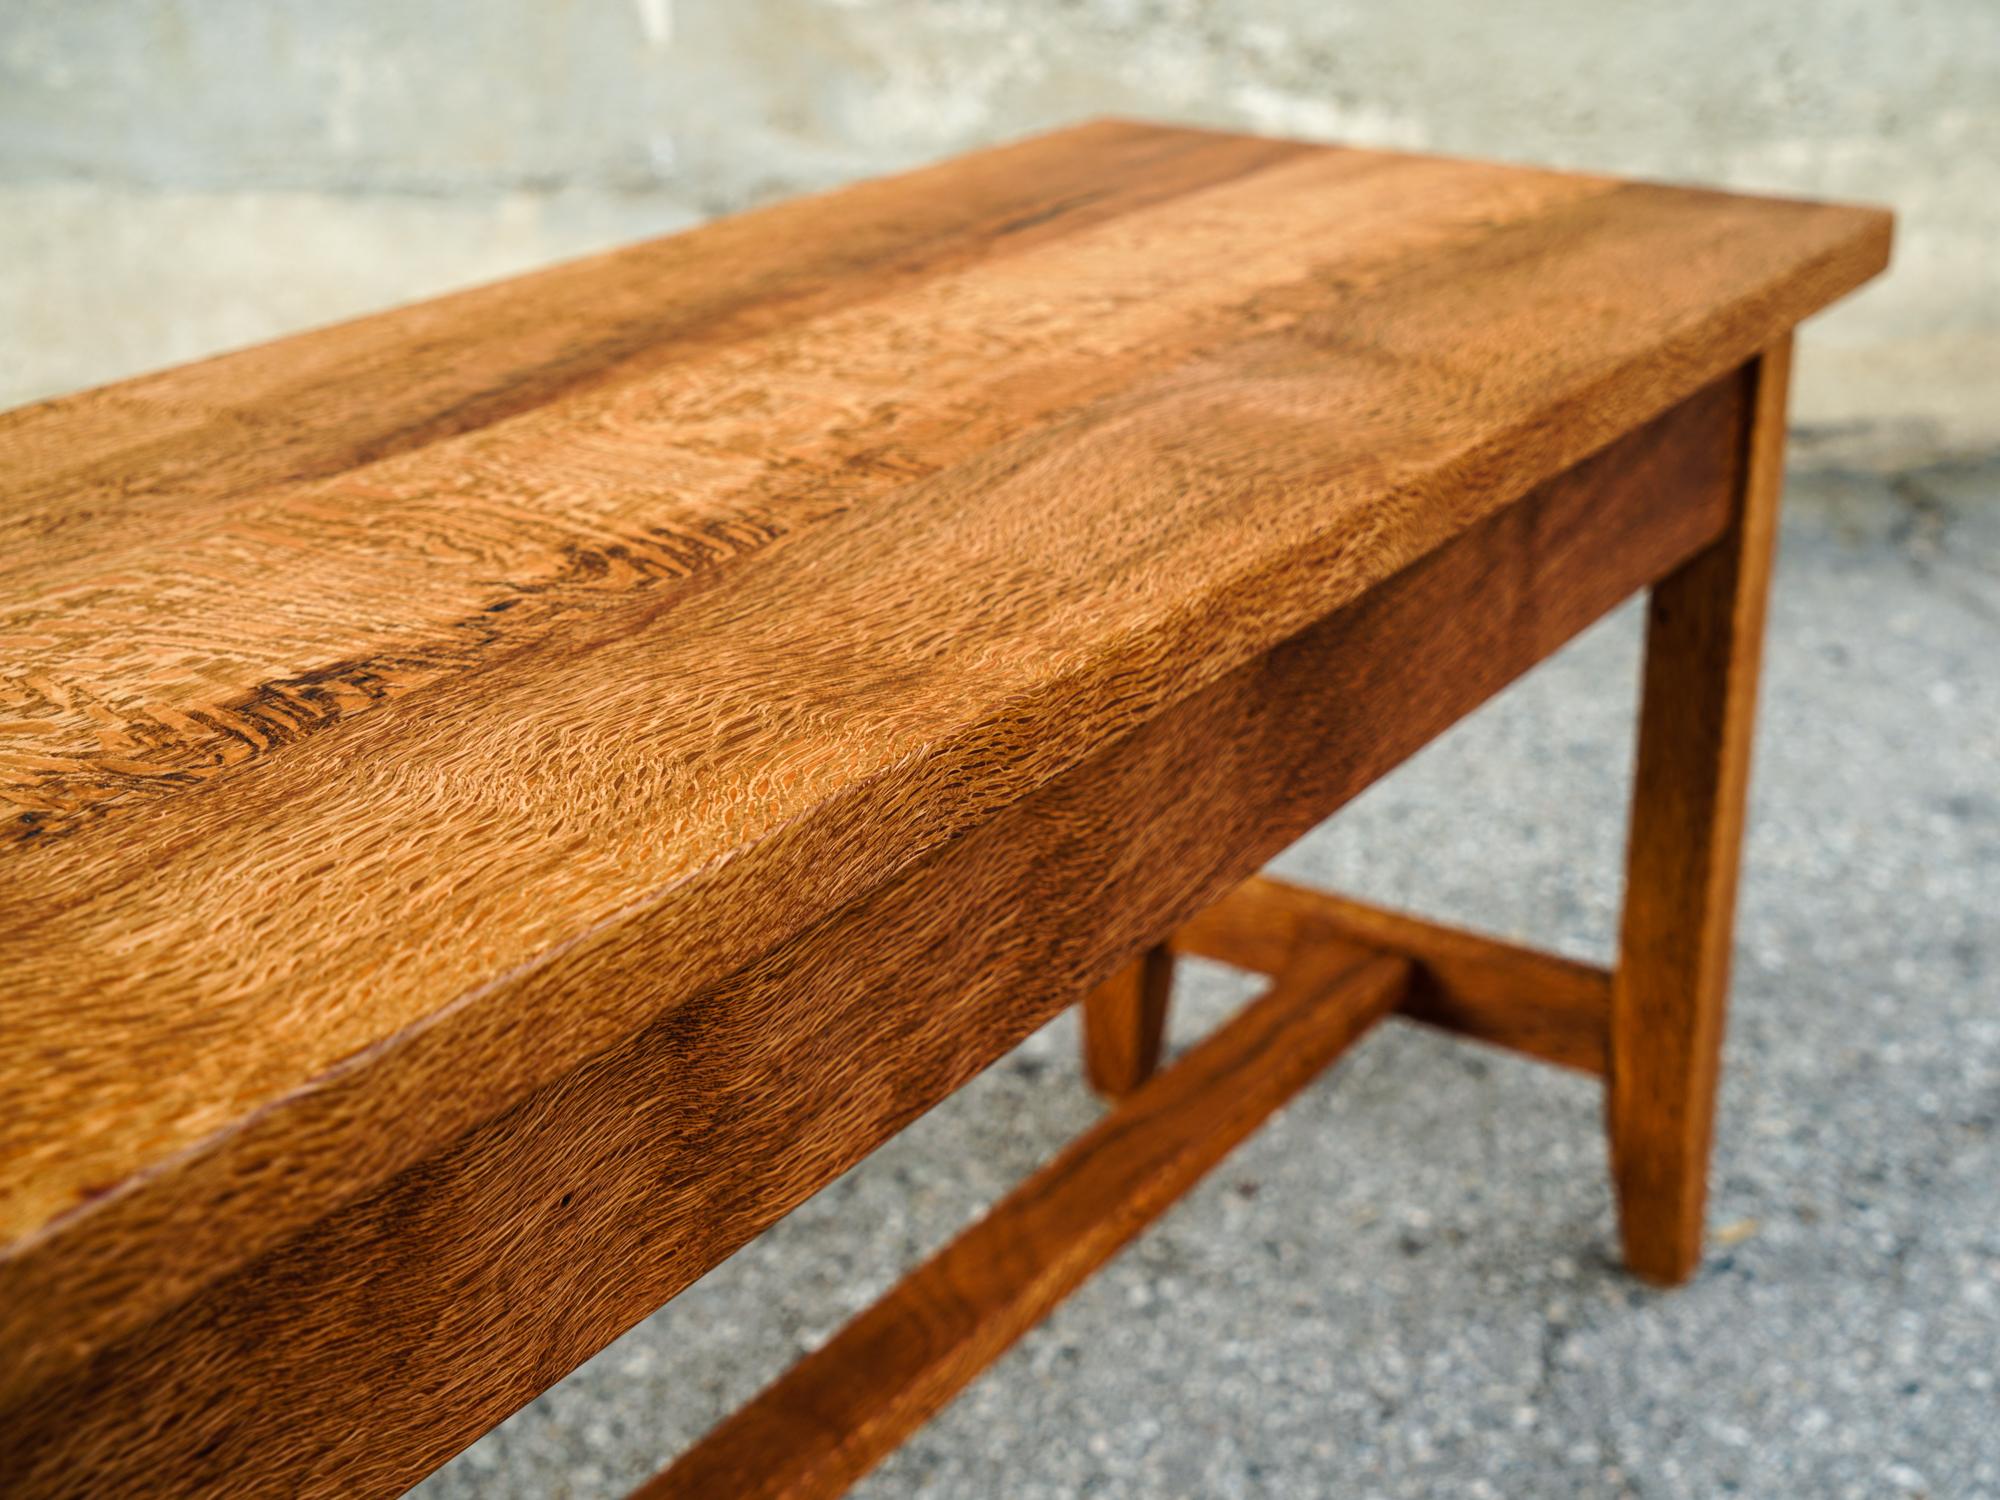 Piano Bench-04943.jpg